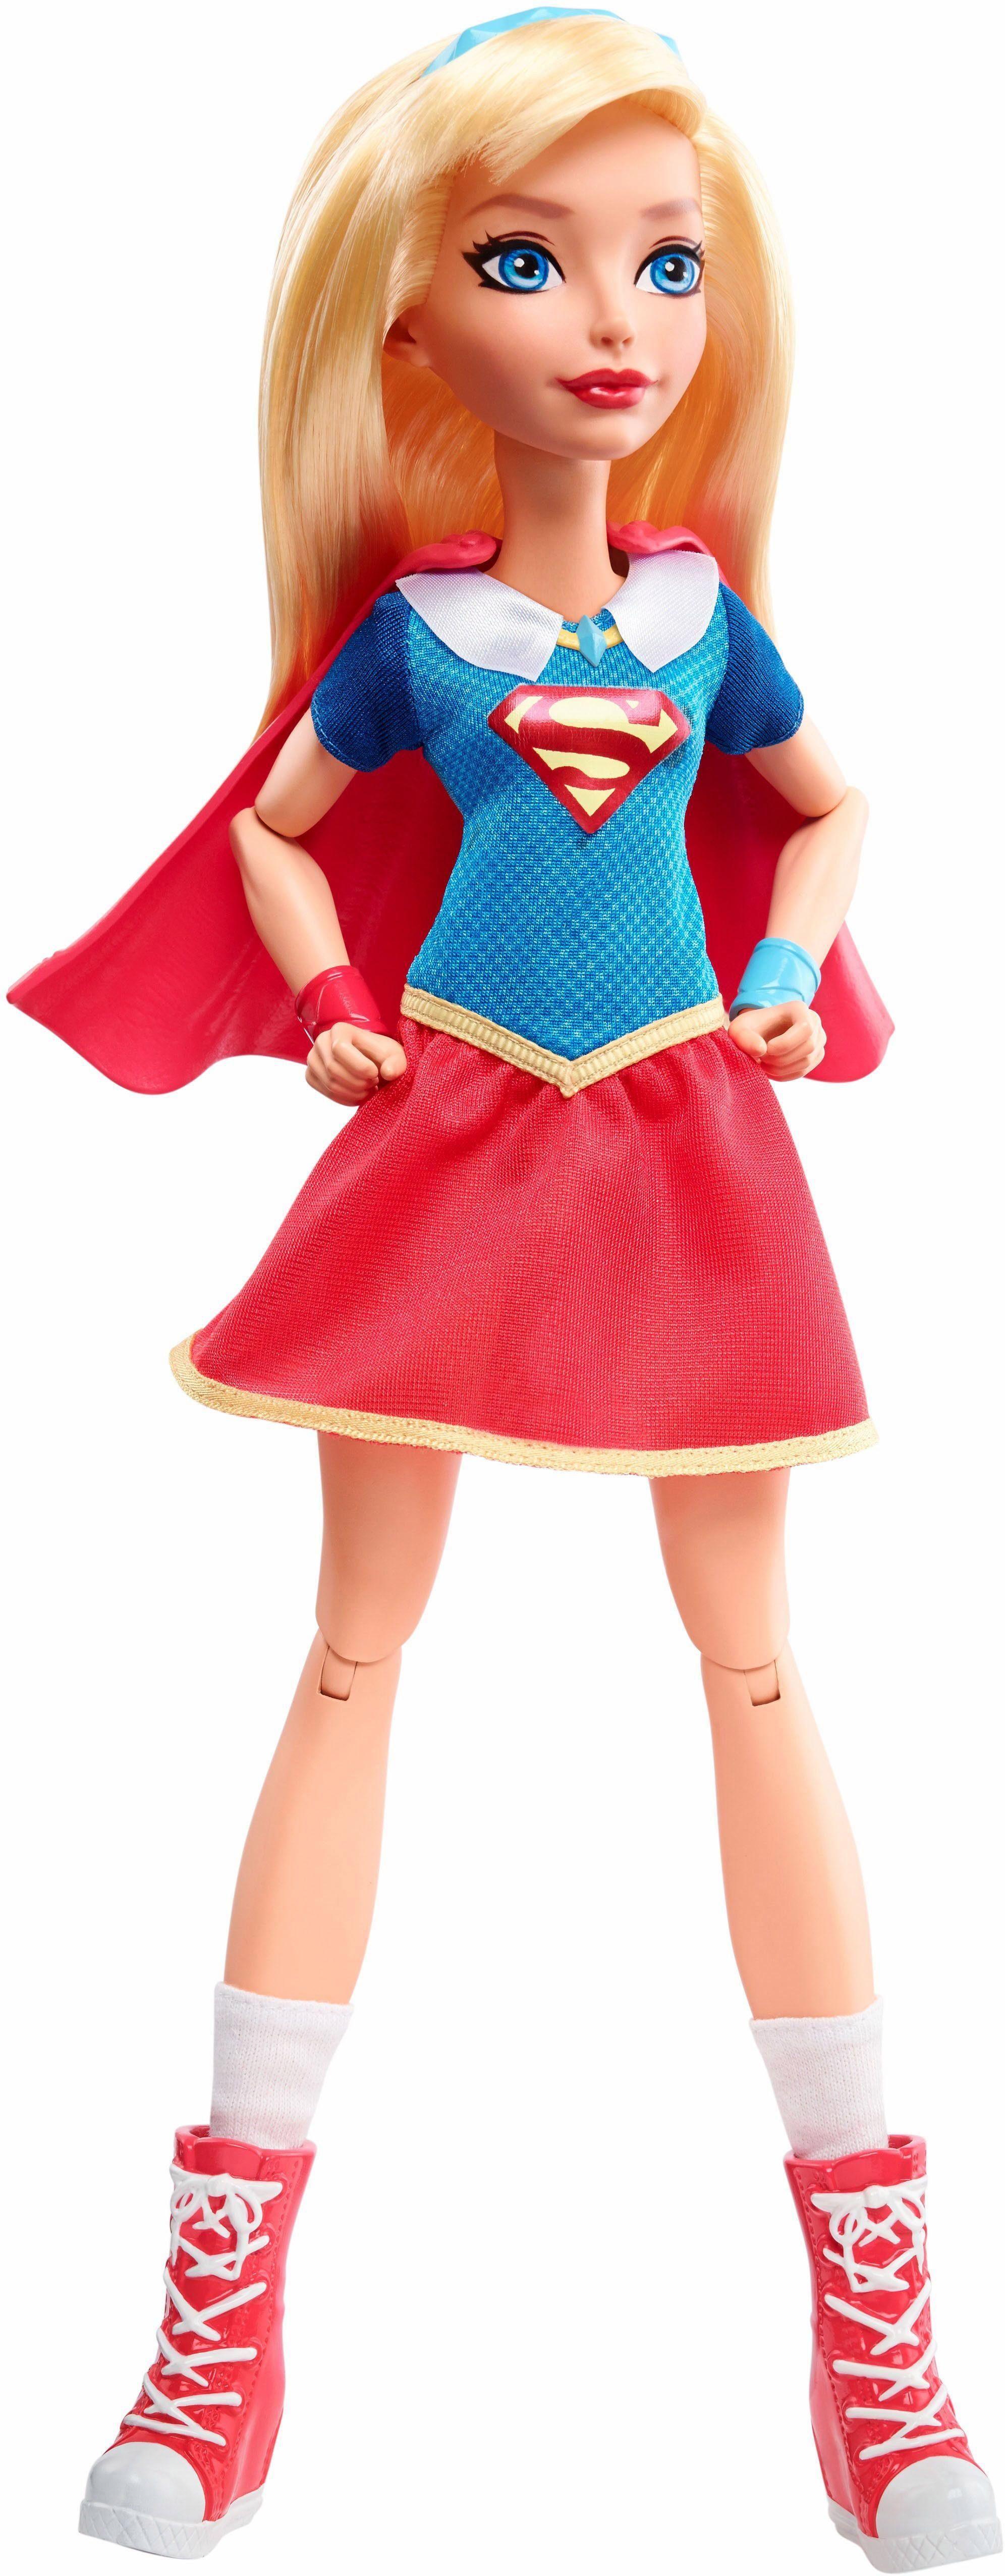 Mattel Puppe, »DC Super Hero Girls Supergirl«